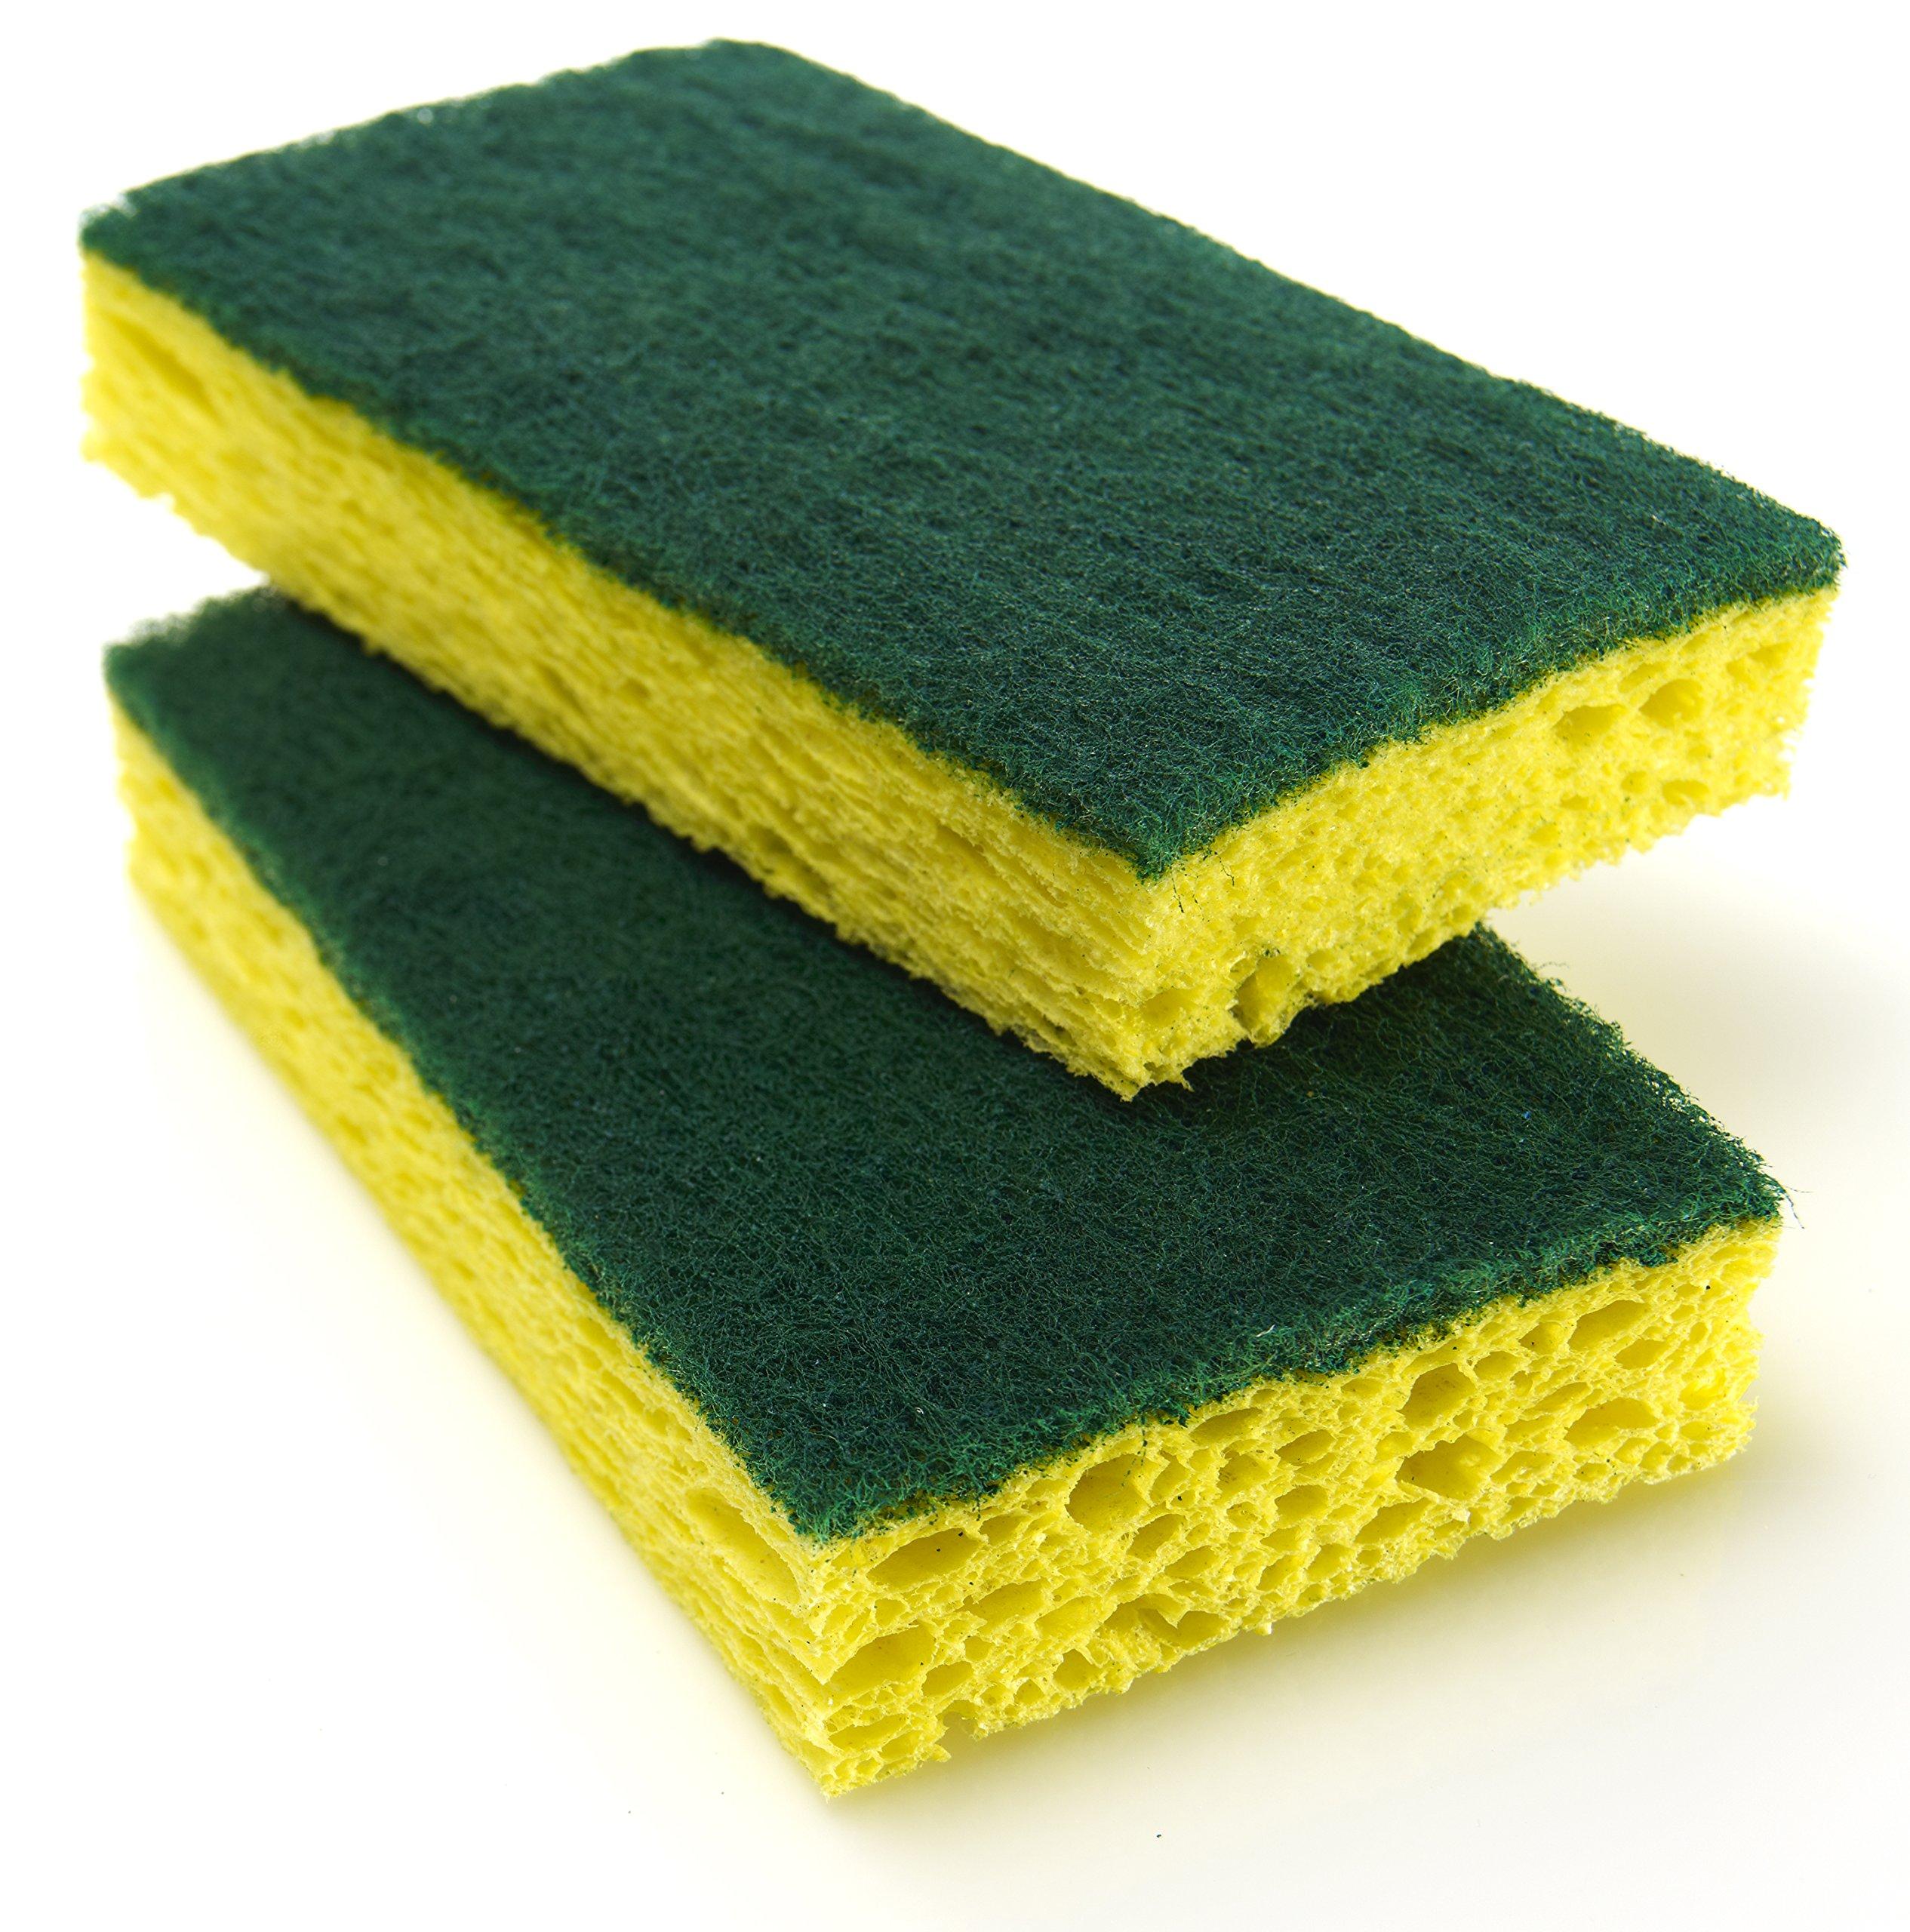 Scotch-Brite Heavy Duty Sponge - 2 sponges